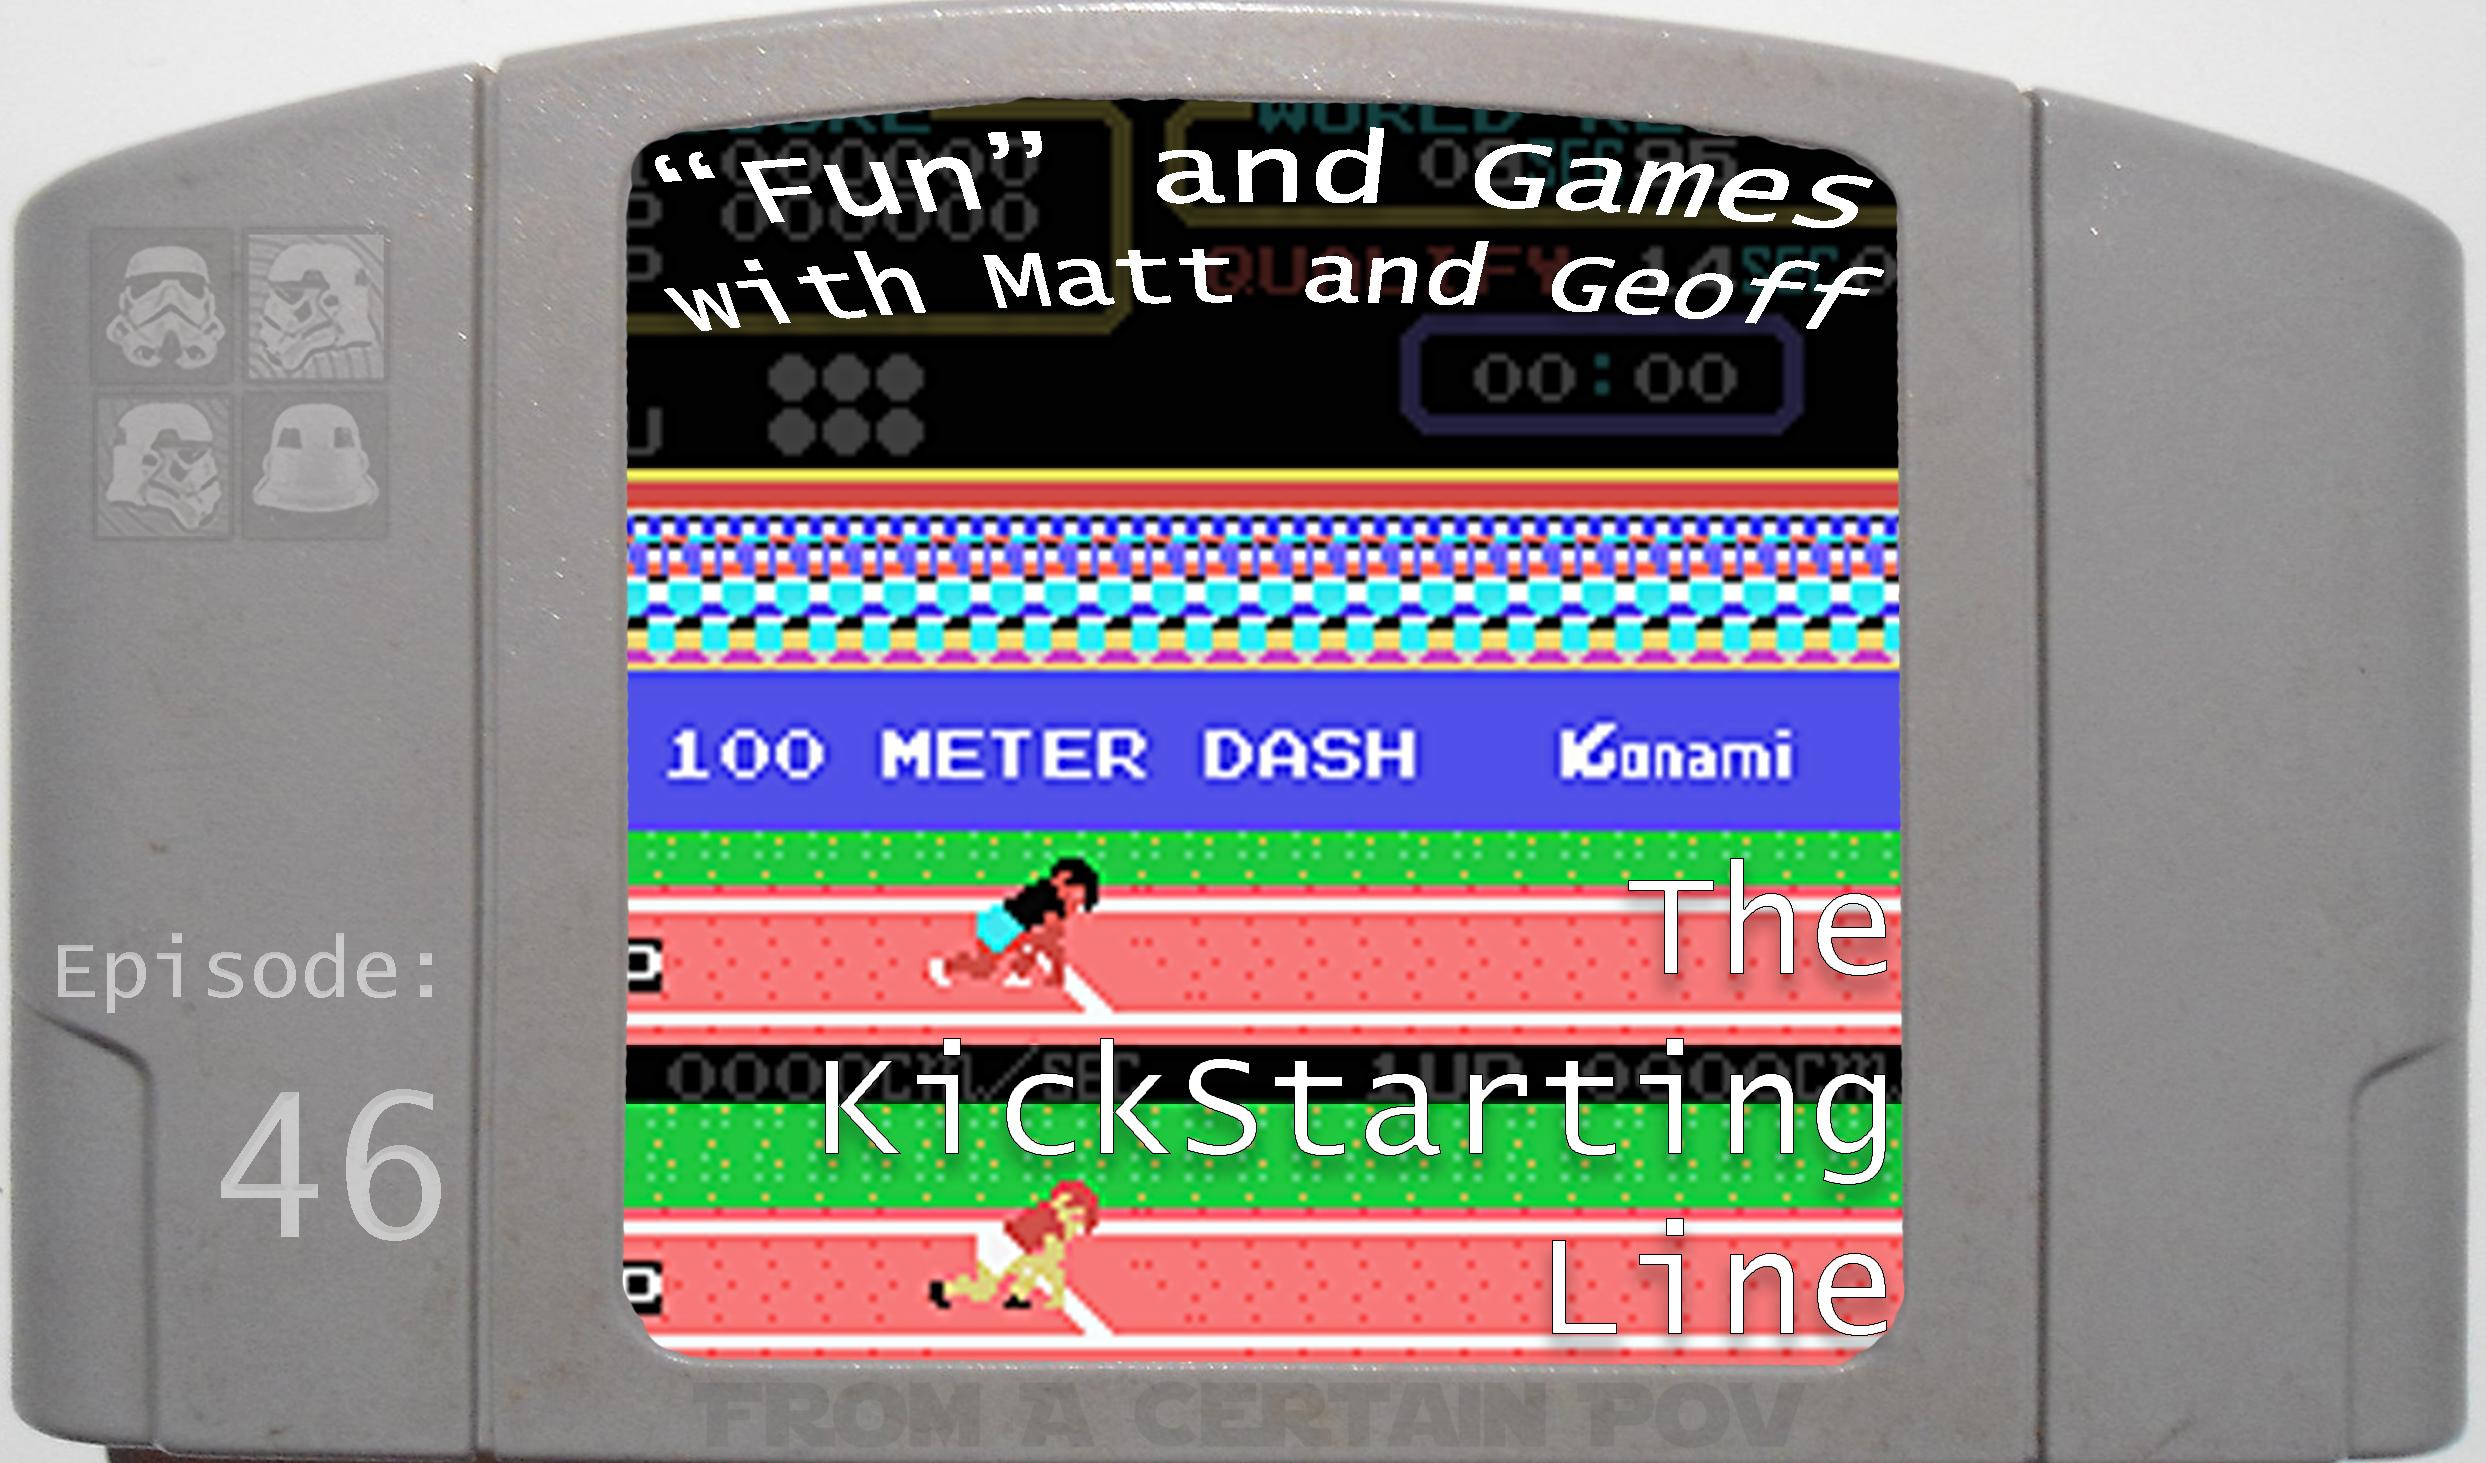 46 - Kickstarting line.jpg